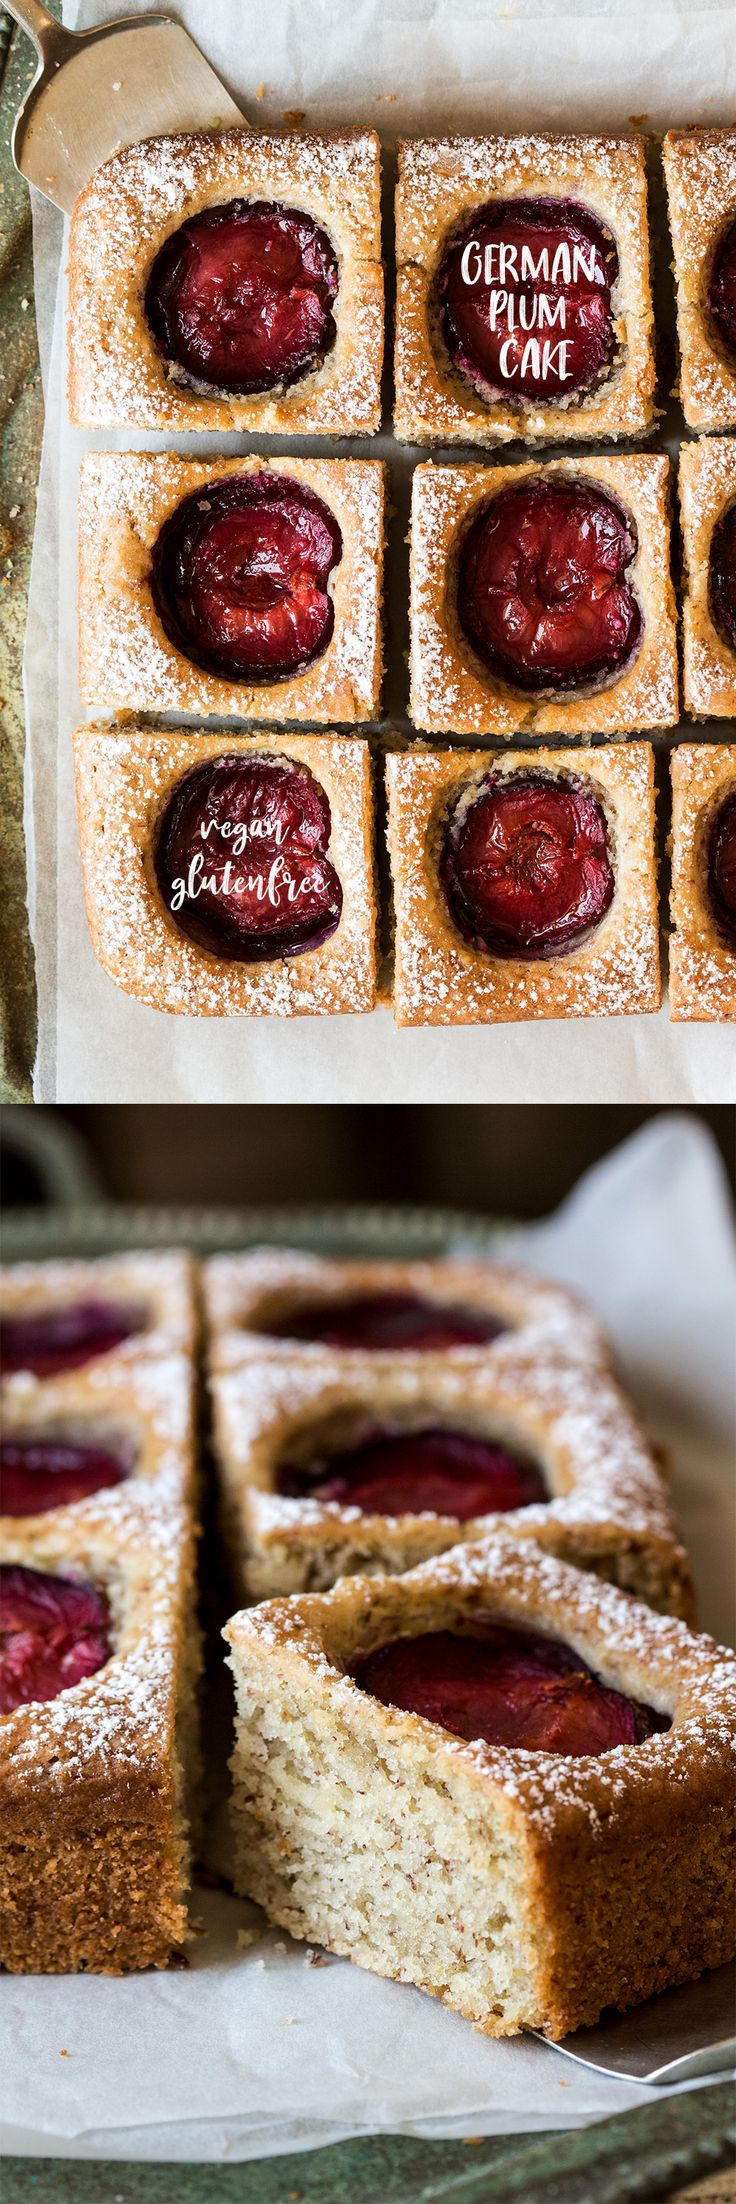 #plums #plumcake #cake #plum #german #vegan #glutenfree #eggfree #dairyfree #easy #recipe